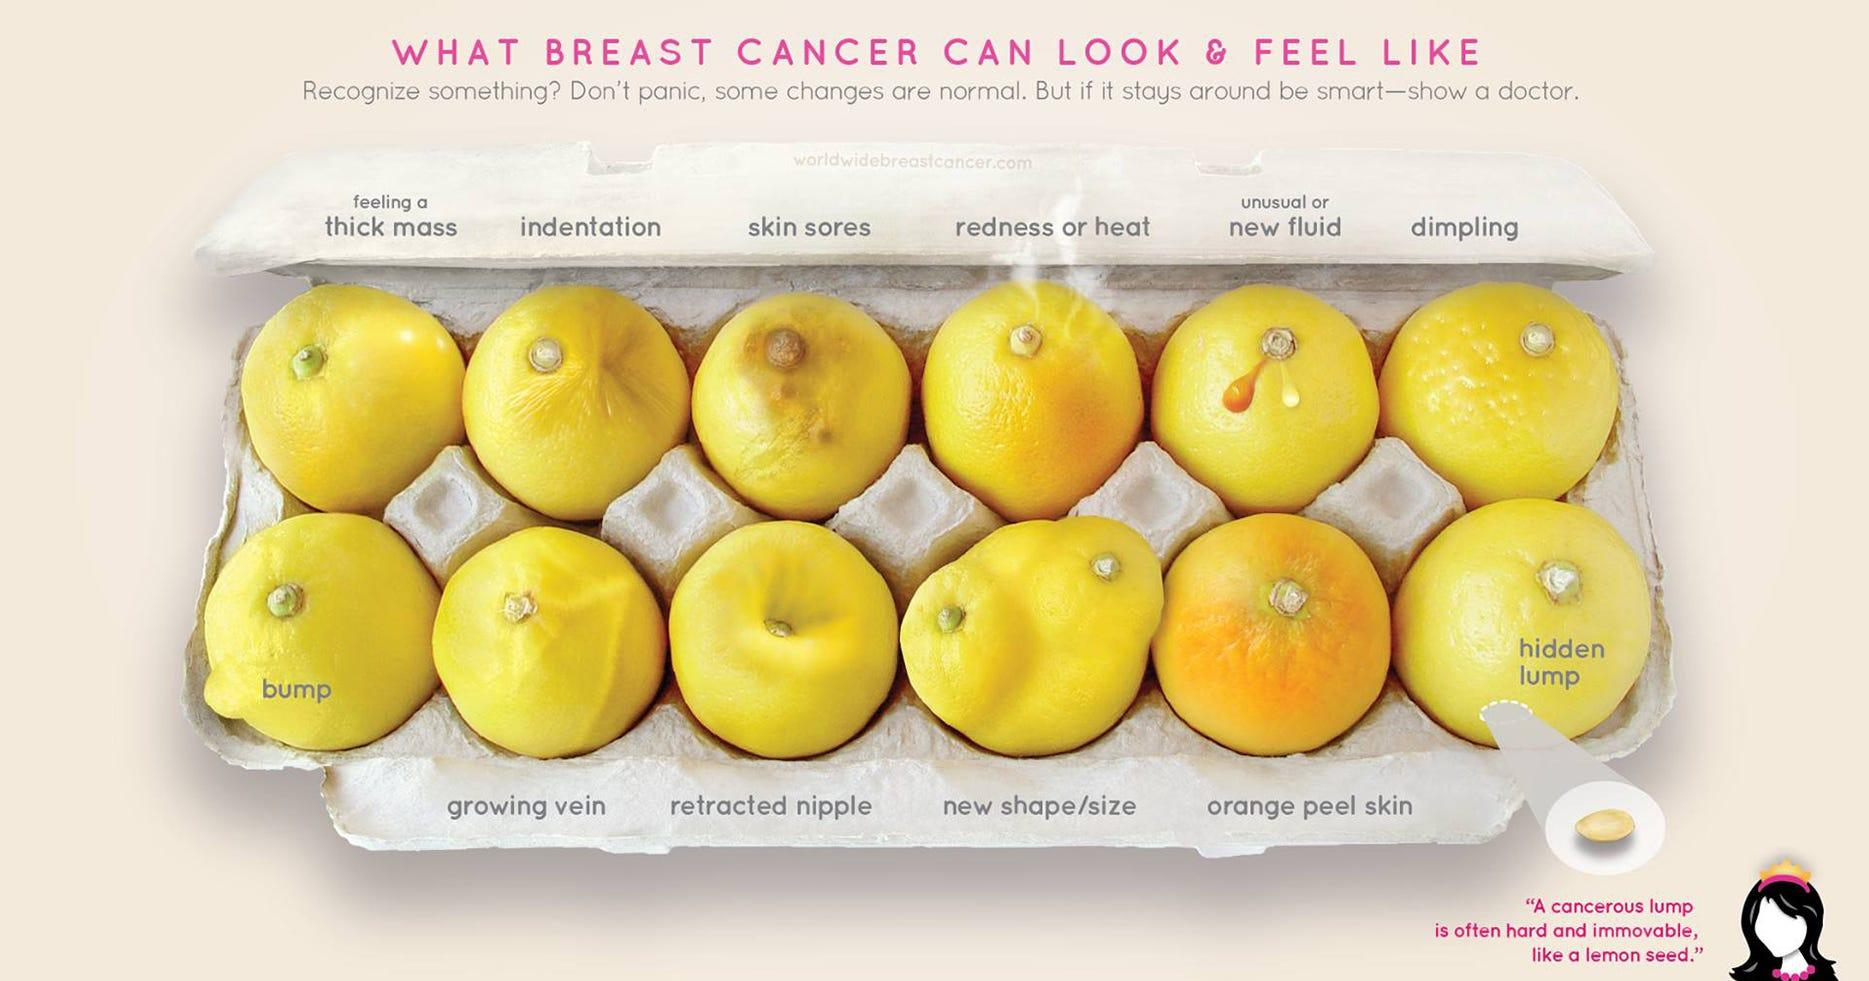 Lemons Breast Cancer Symptoms Campaign